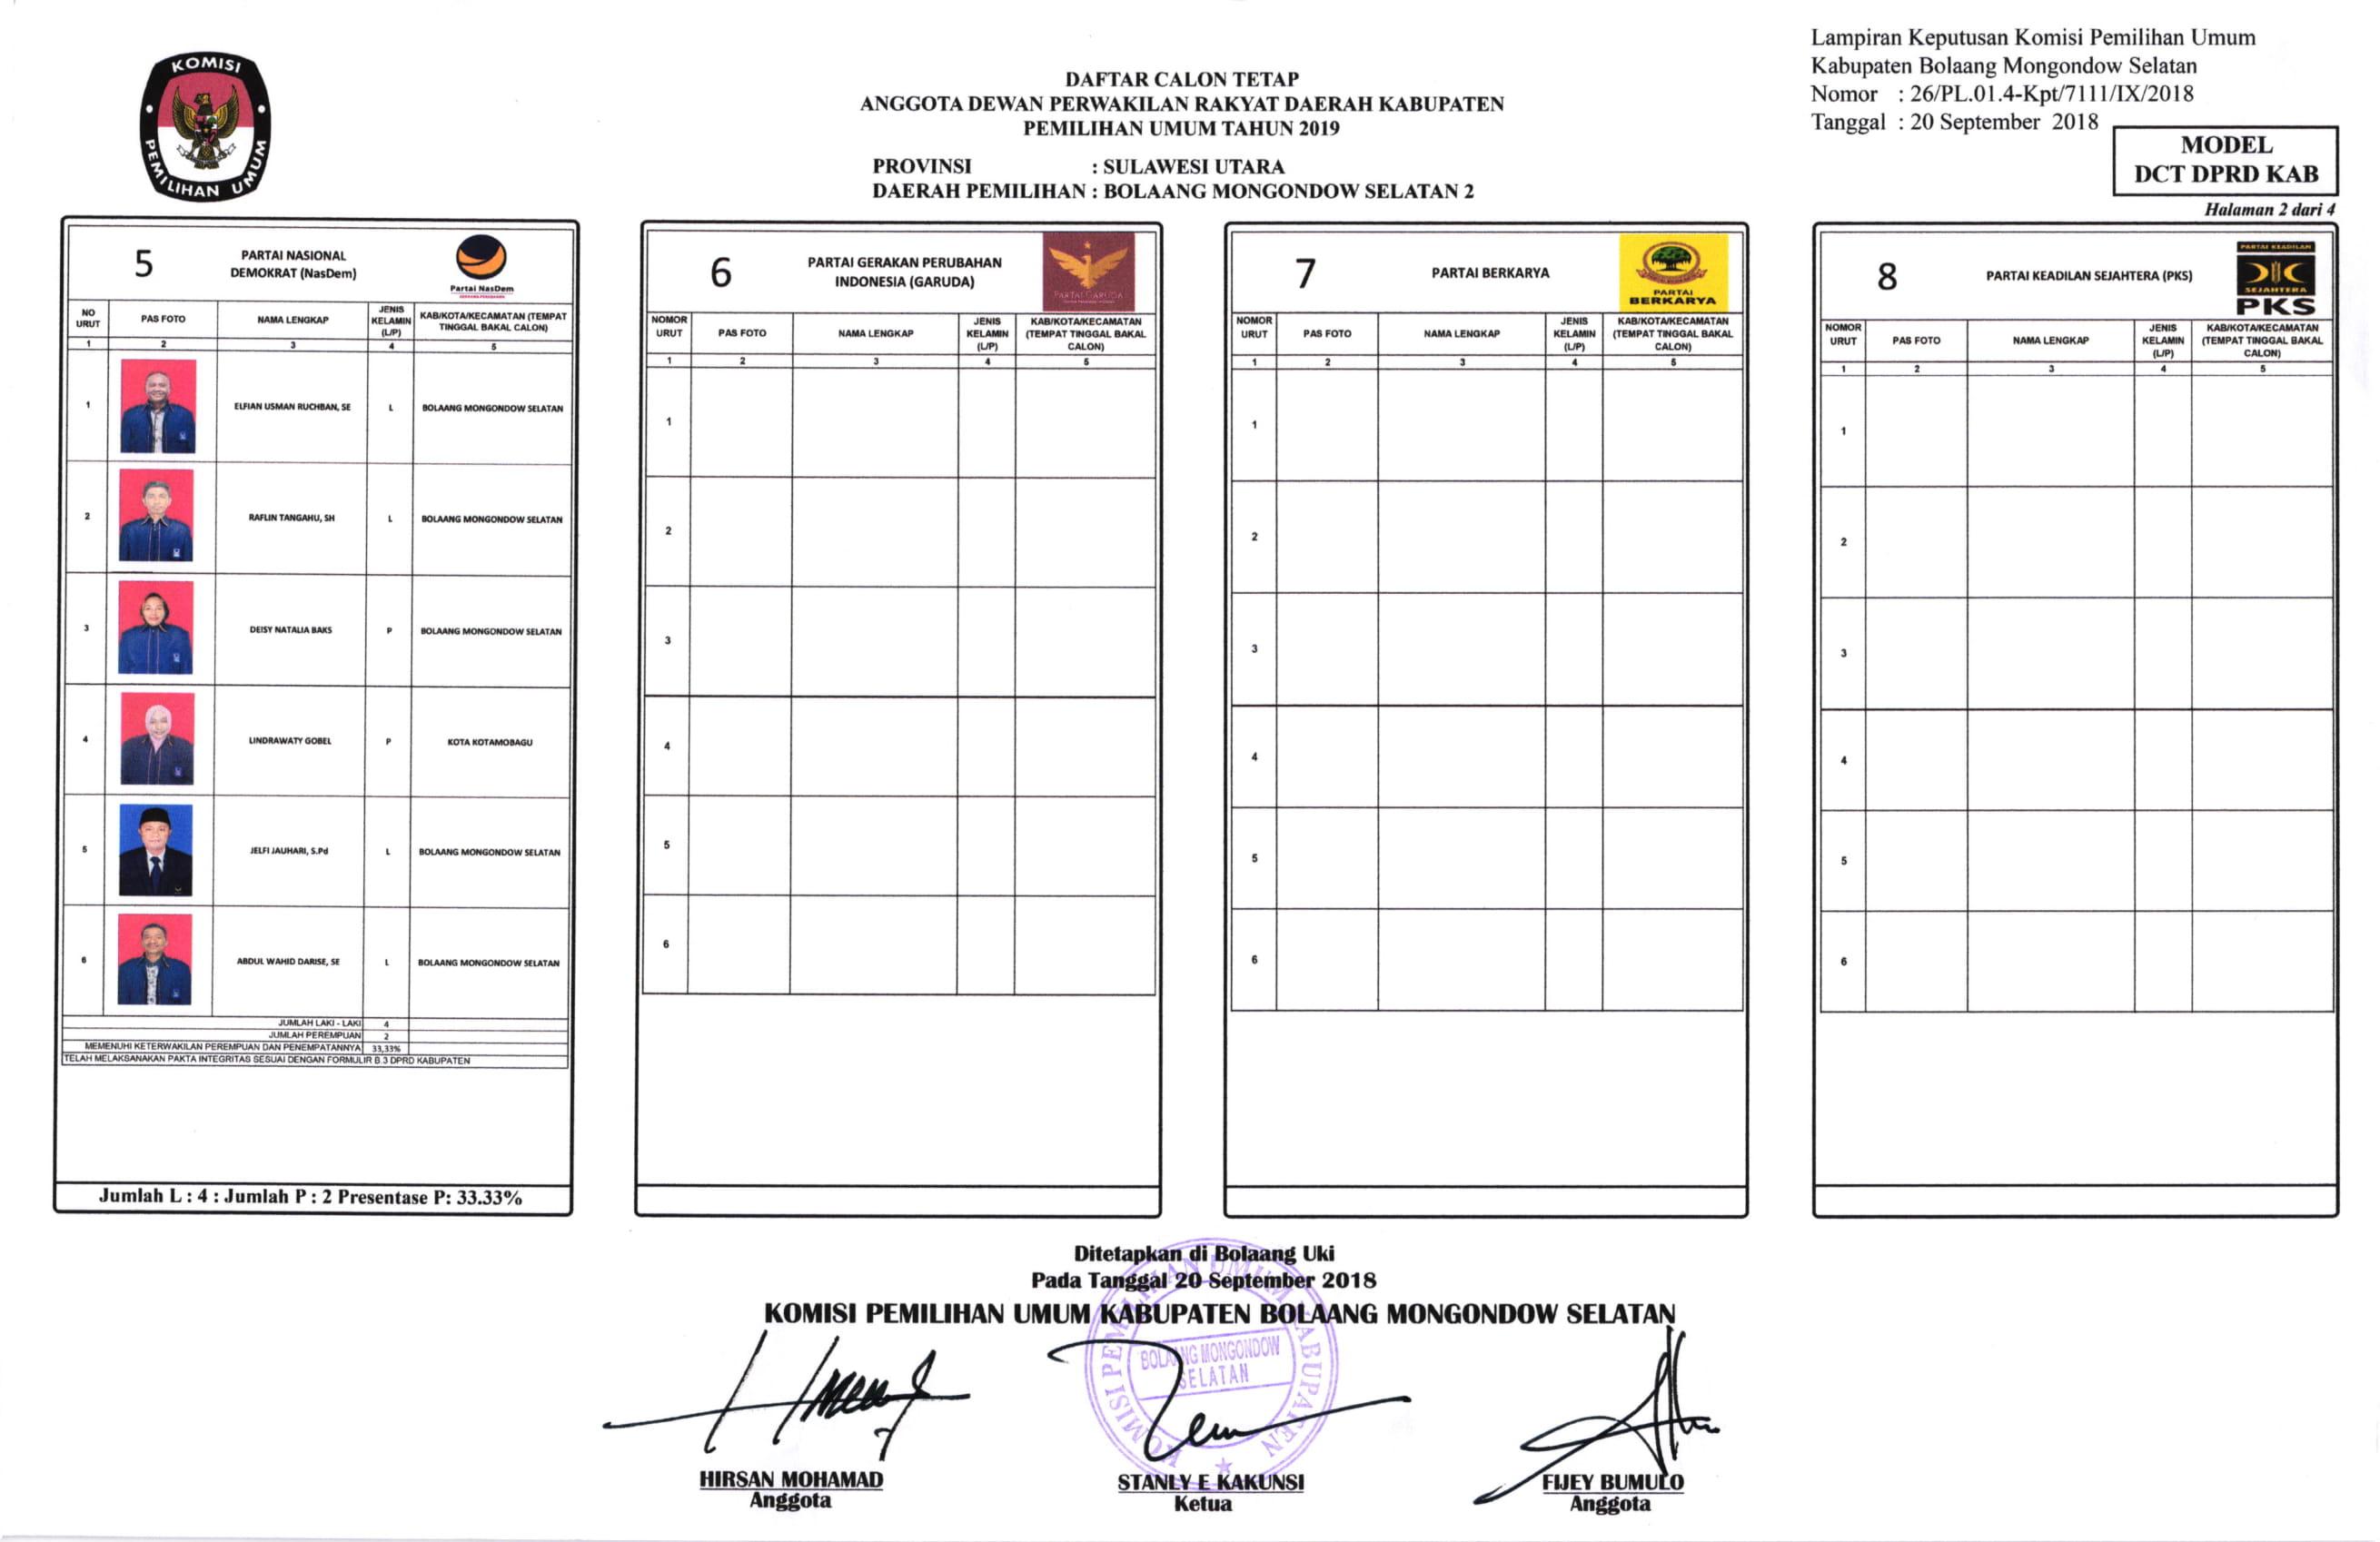 Daftar Calon Tetap Anggota DPRD Kabupaten Bolaang Mongondow Selatan Pemilu 2019 Dapil 2 - Duta ...